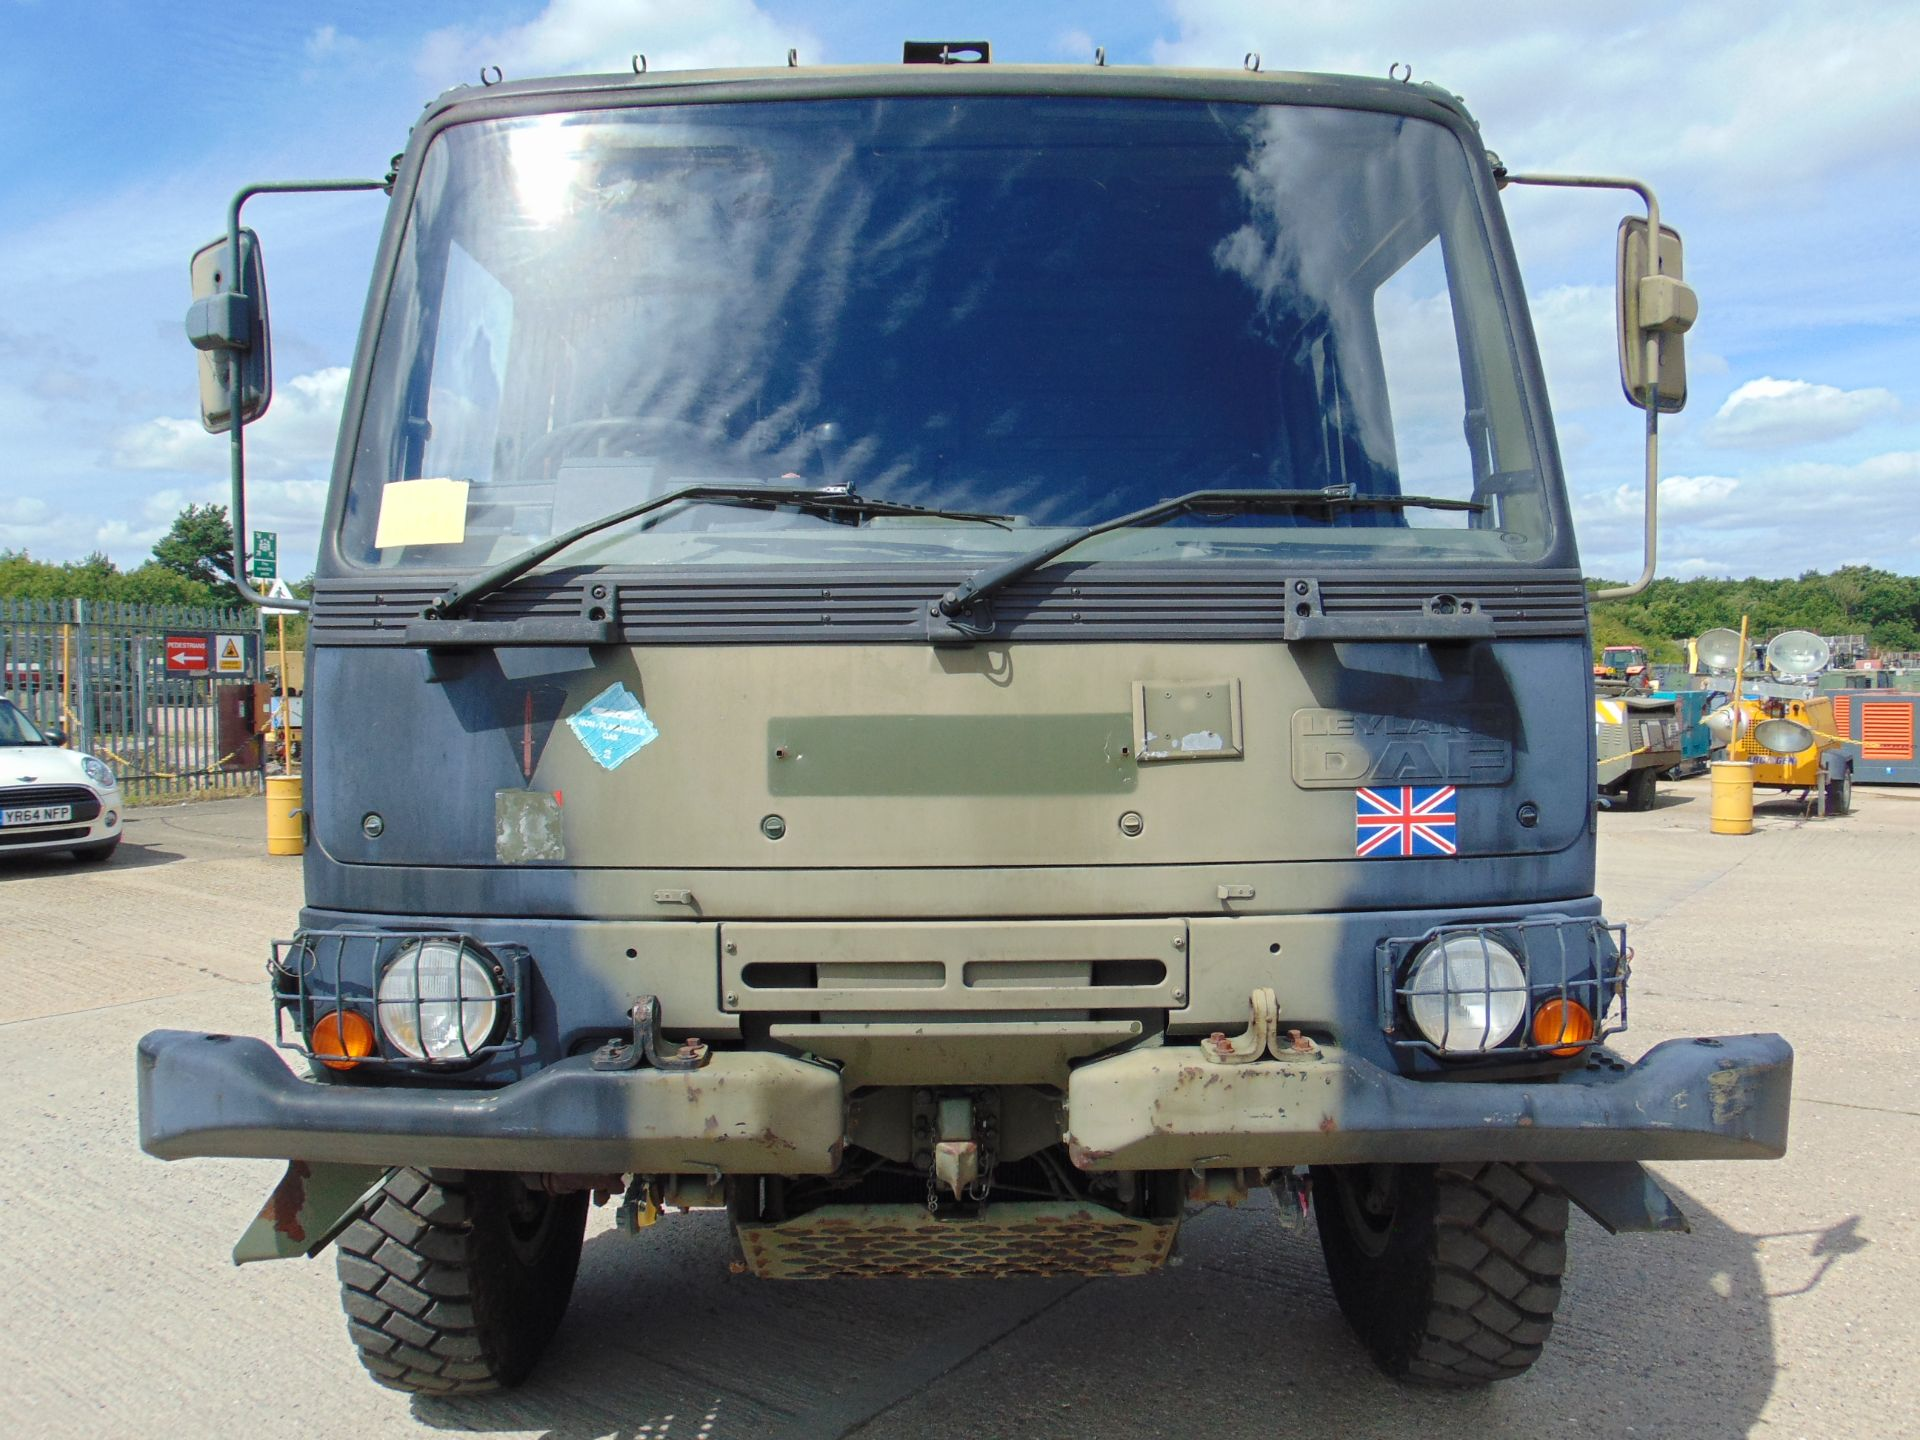 Leyland Daf 45/150 4 x 4 - Image 2 of 22